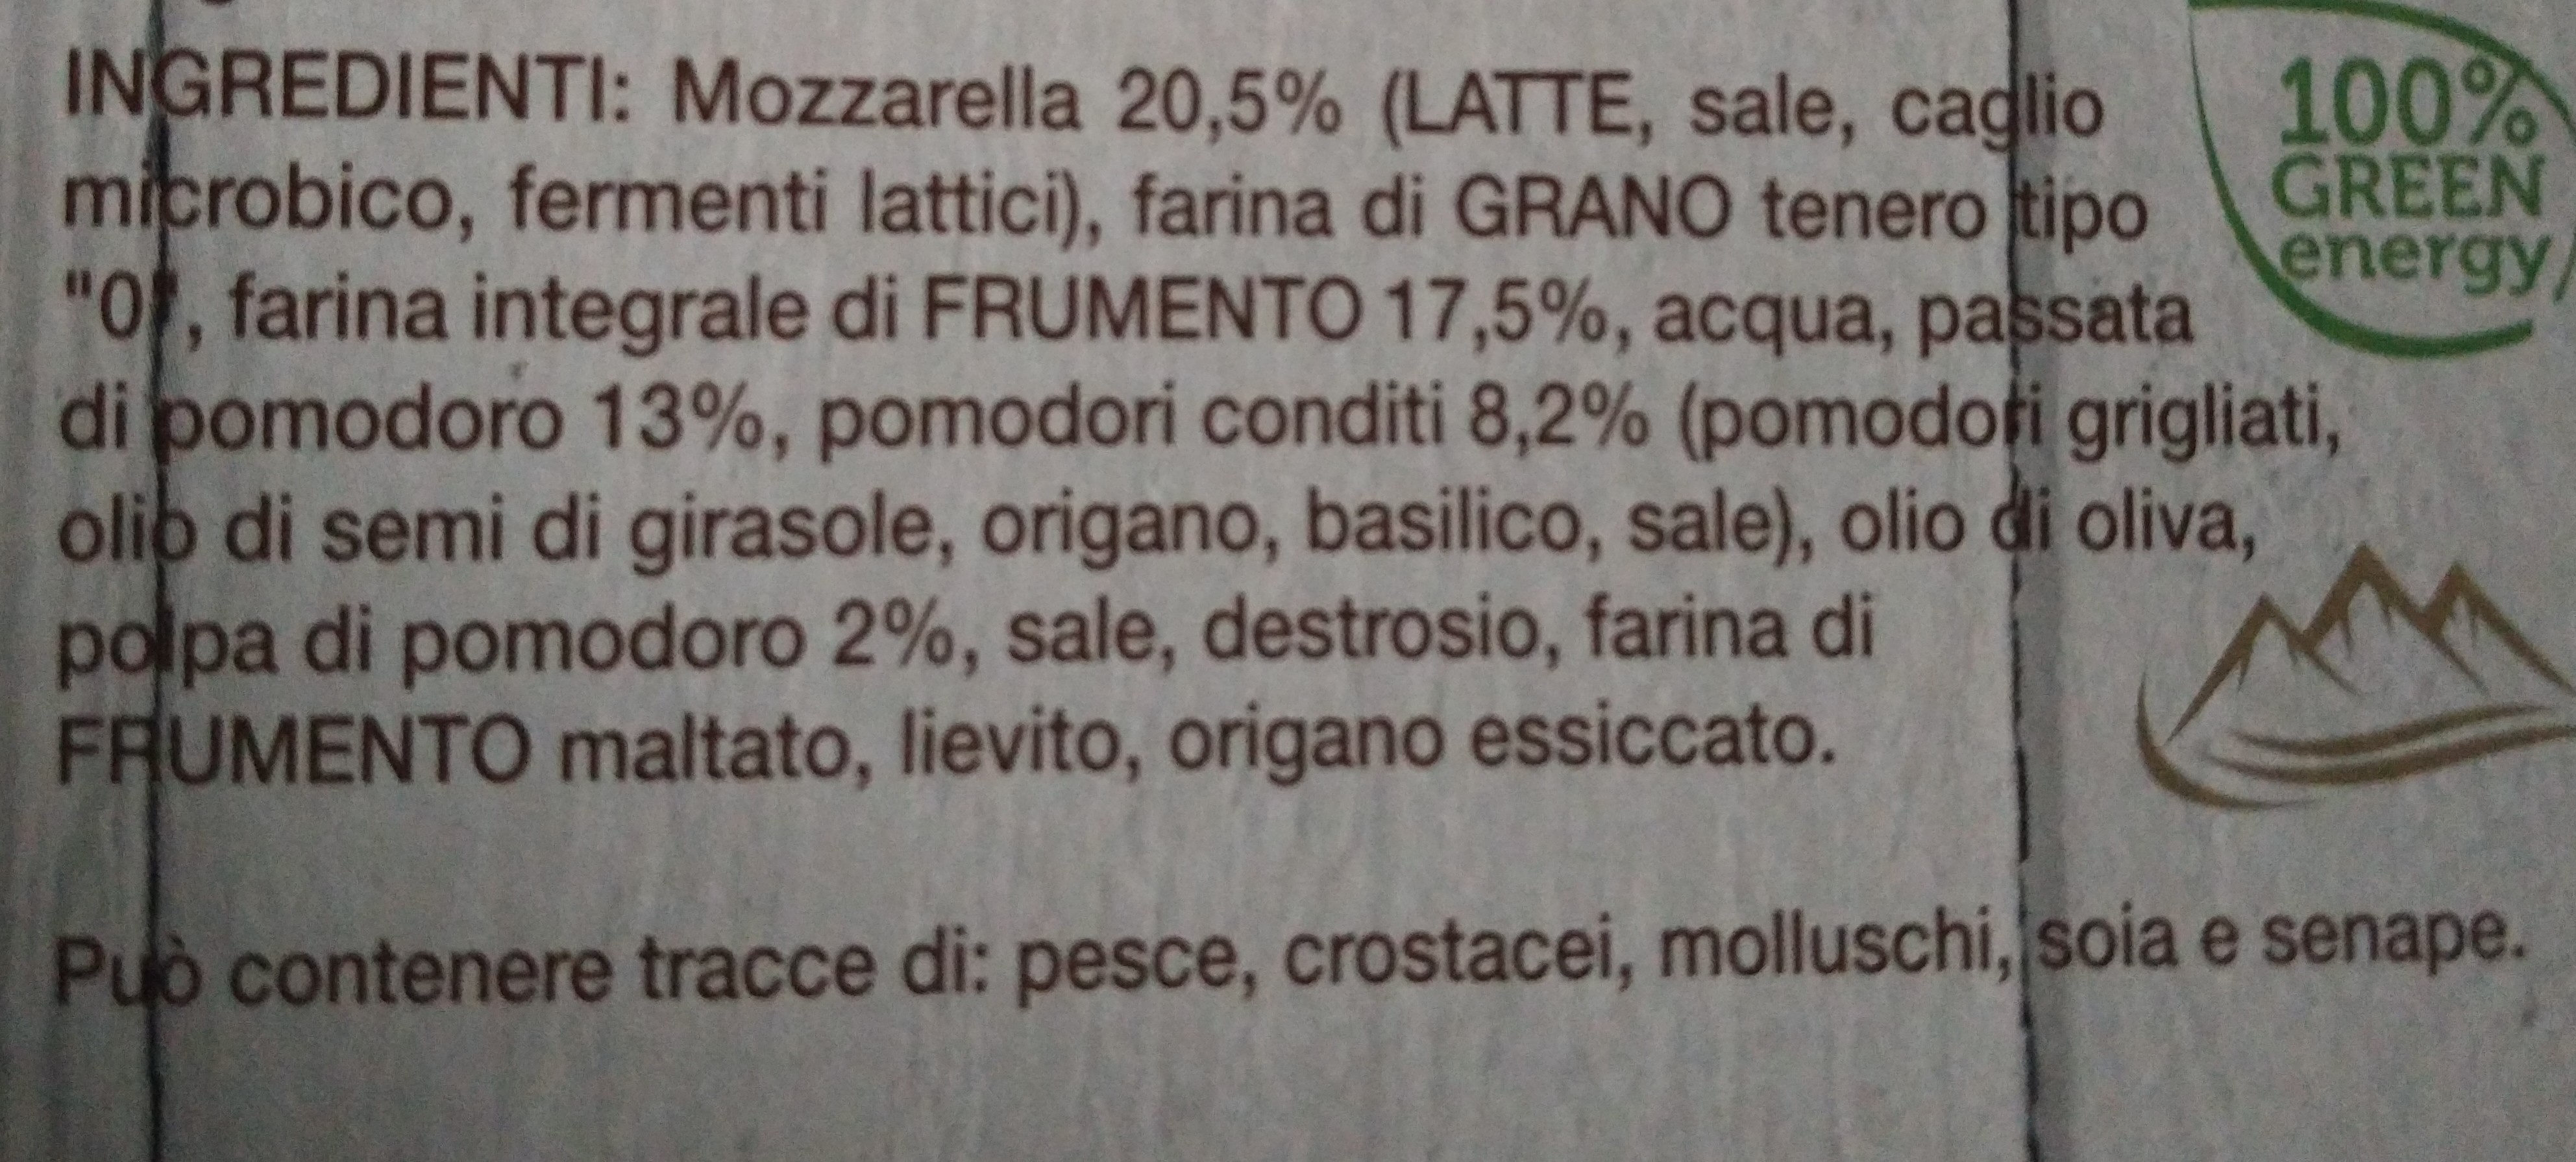 margherita con farina integrale - Ingredients - it